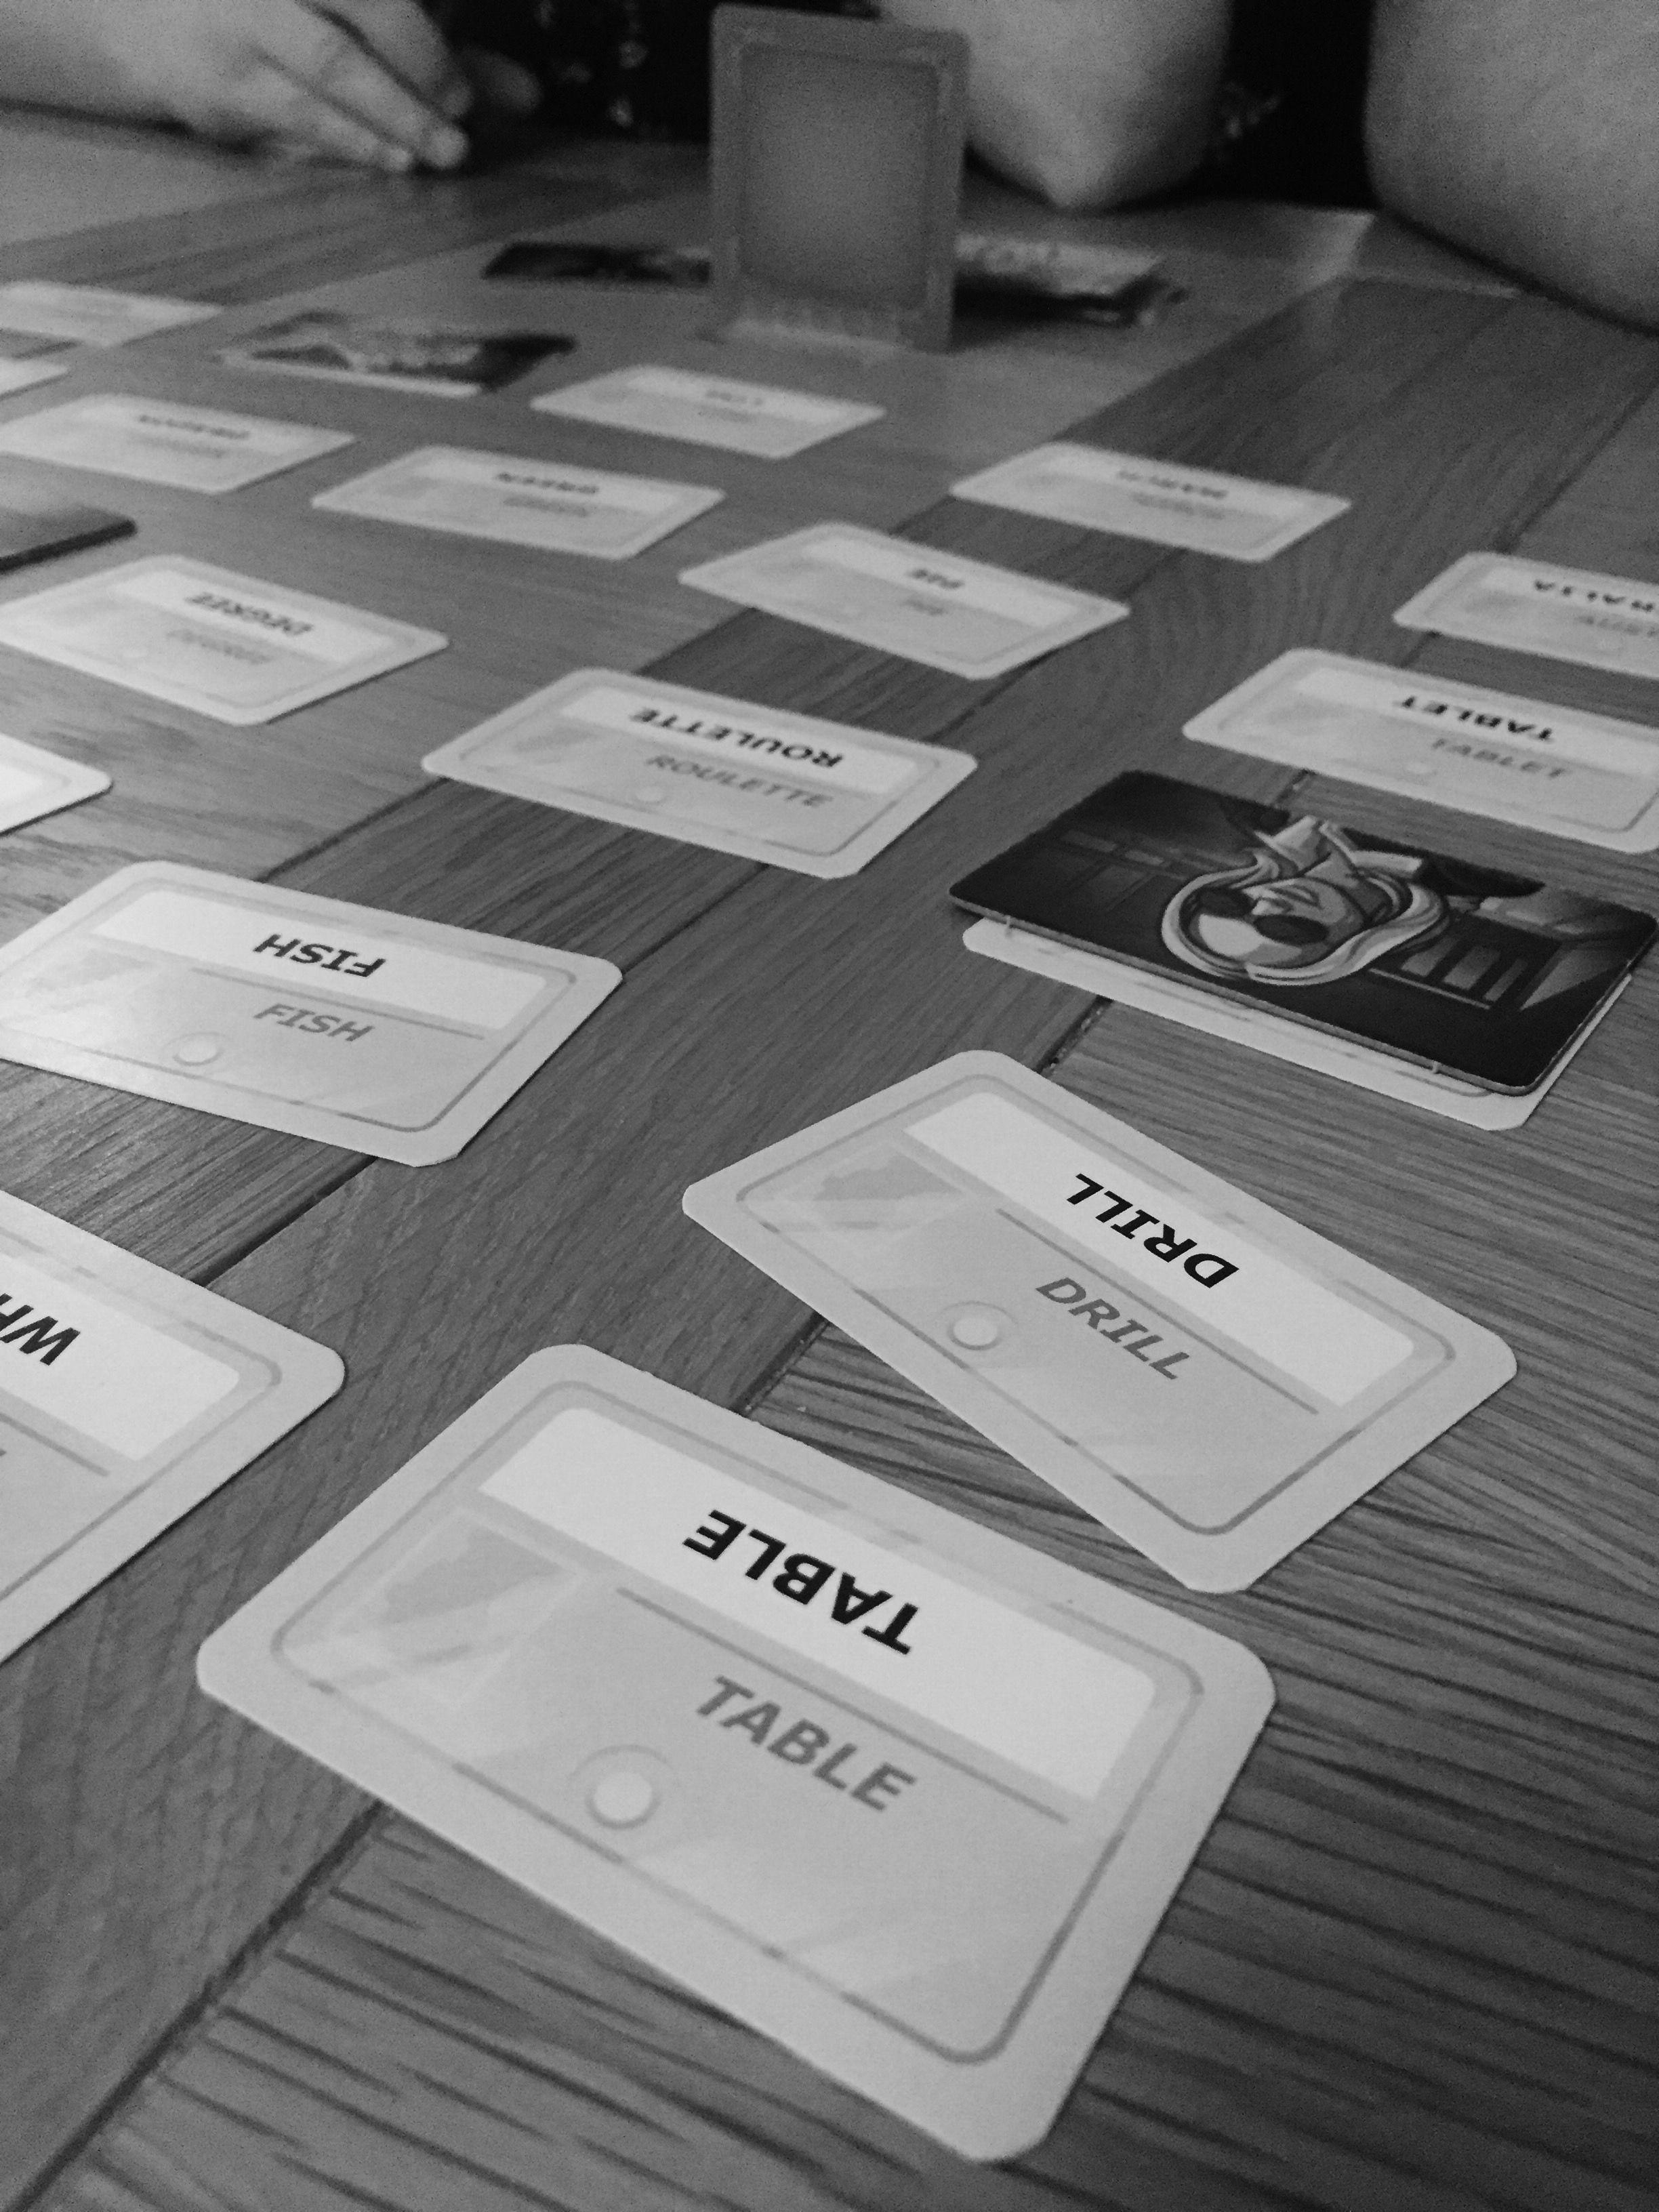 codenames fourwasoptimistic Bored games, Code names